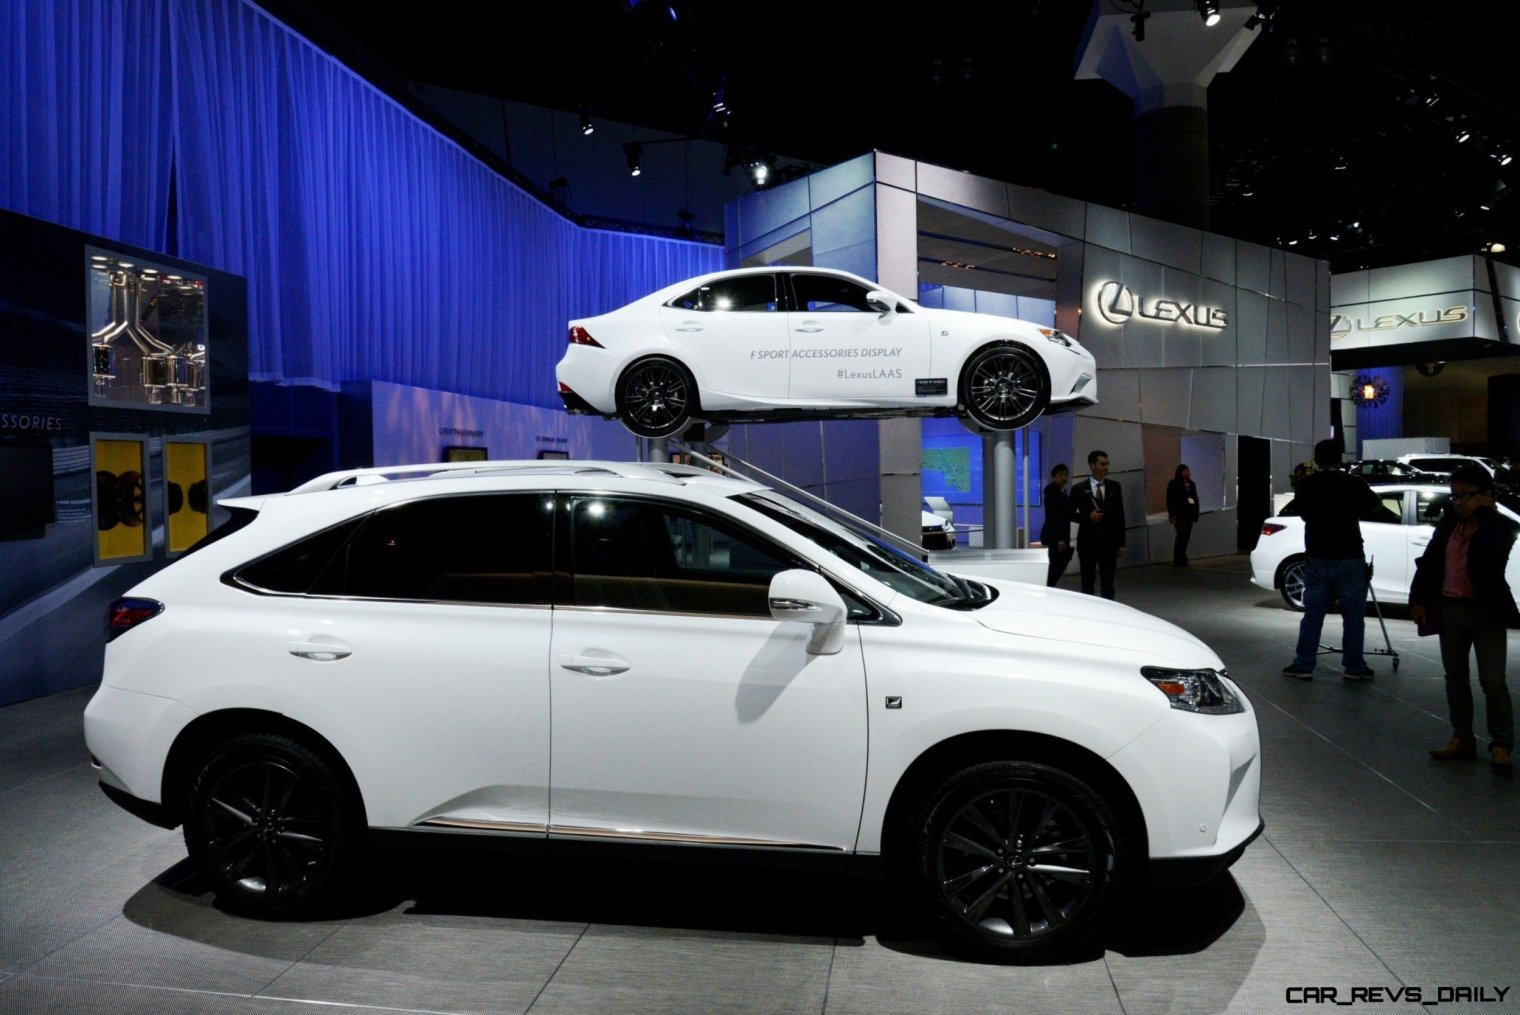 Car-Revs-Daily.com -- Lexus IS350FSport by Deviant ART is Best in Show SEMA 2013 11